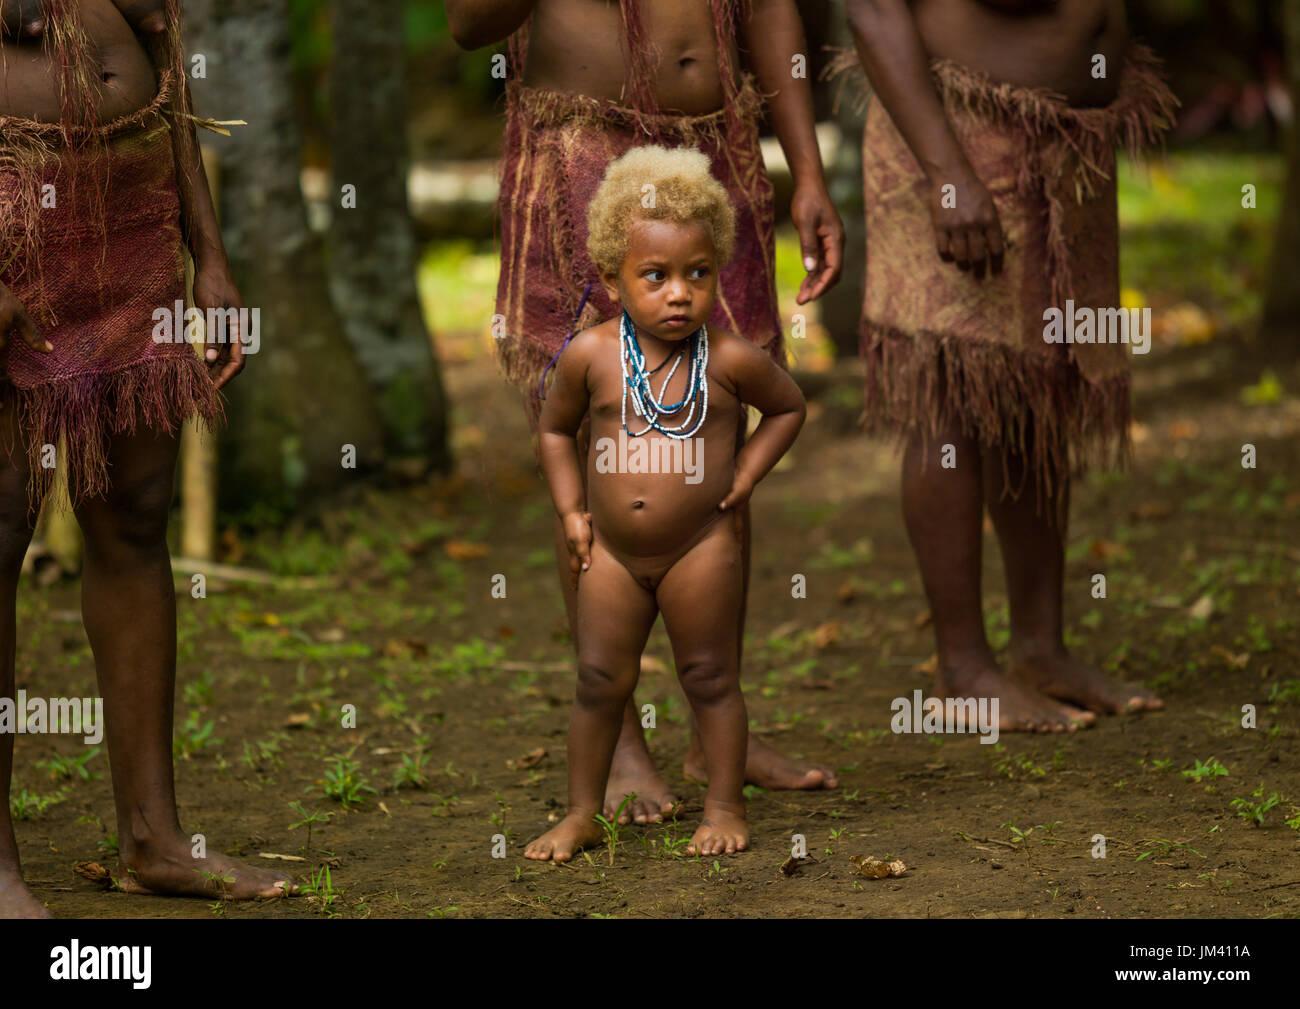 Blonde Big Nambas tribe girl, Malampa Province, Malekula Island, Vanuatu - Stock Image